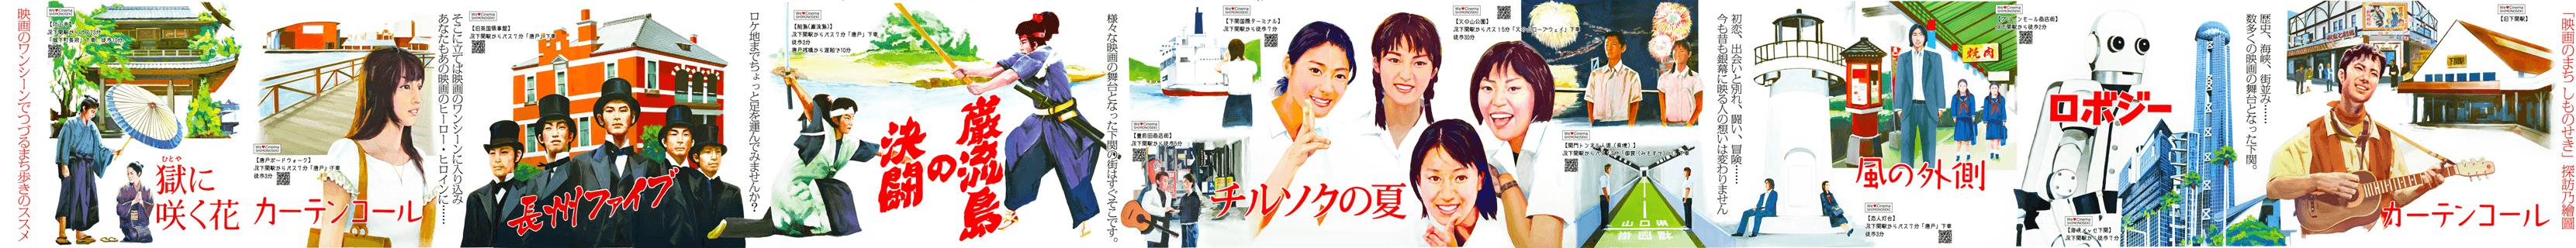 shimonoseki_st_cinema